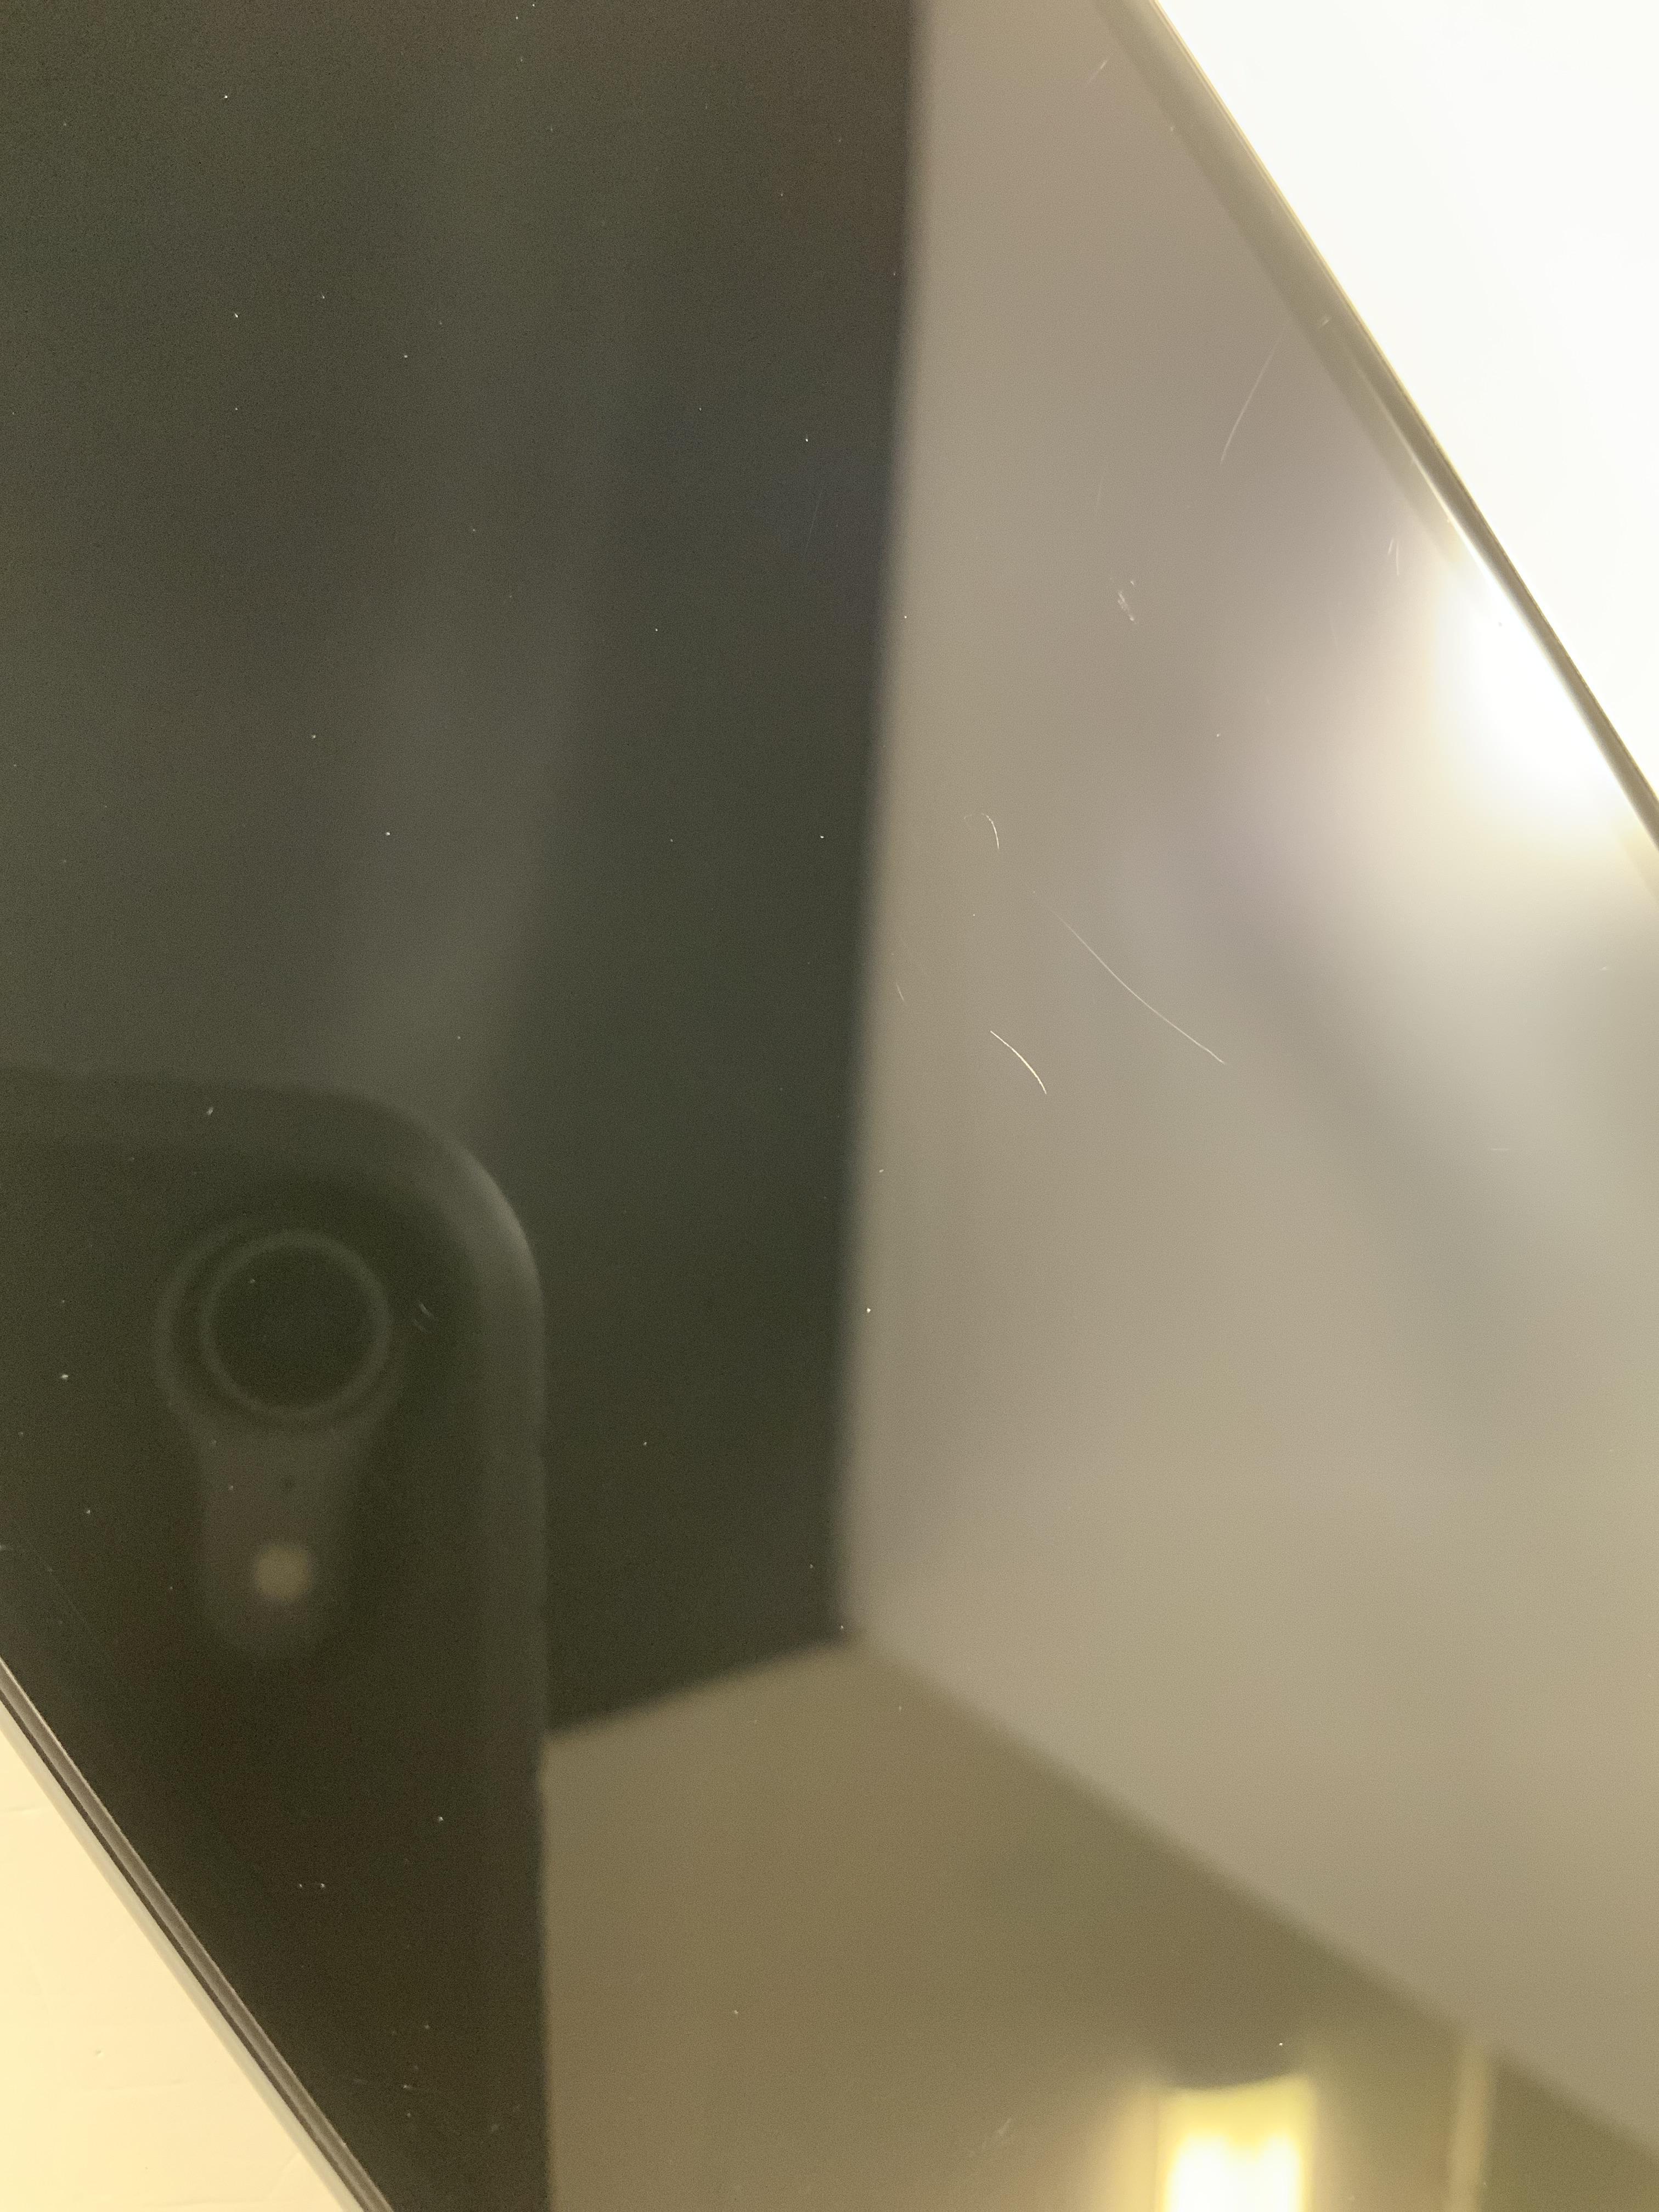 iPhone XS 64GB, 64GB, Space Gray, immagine 4